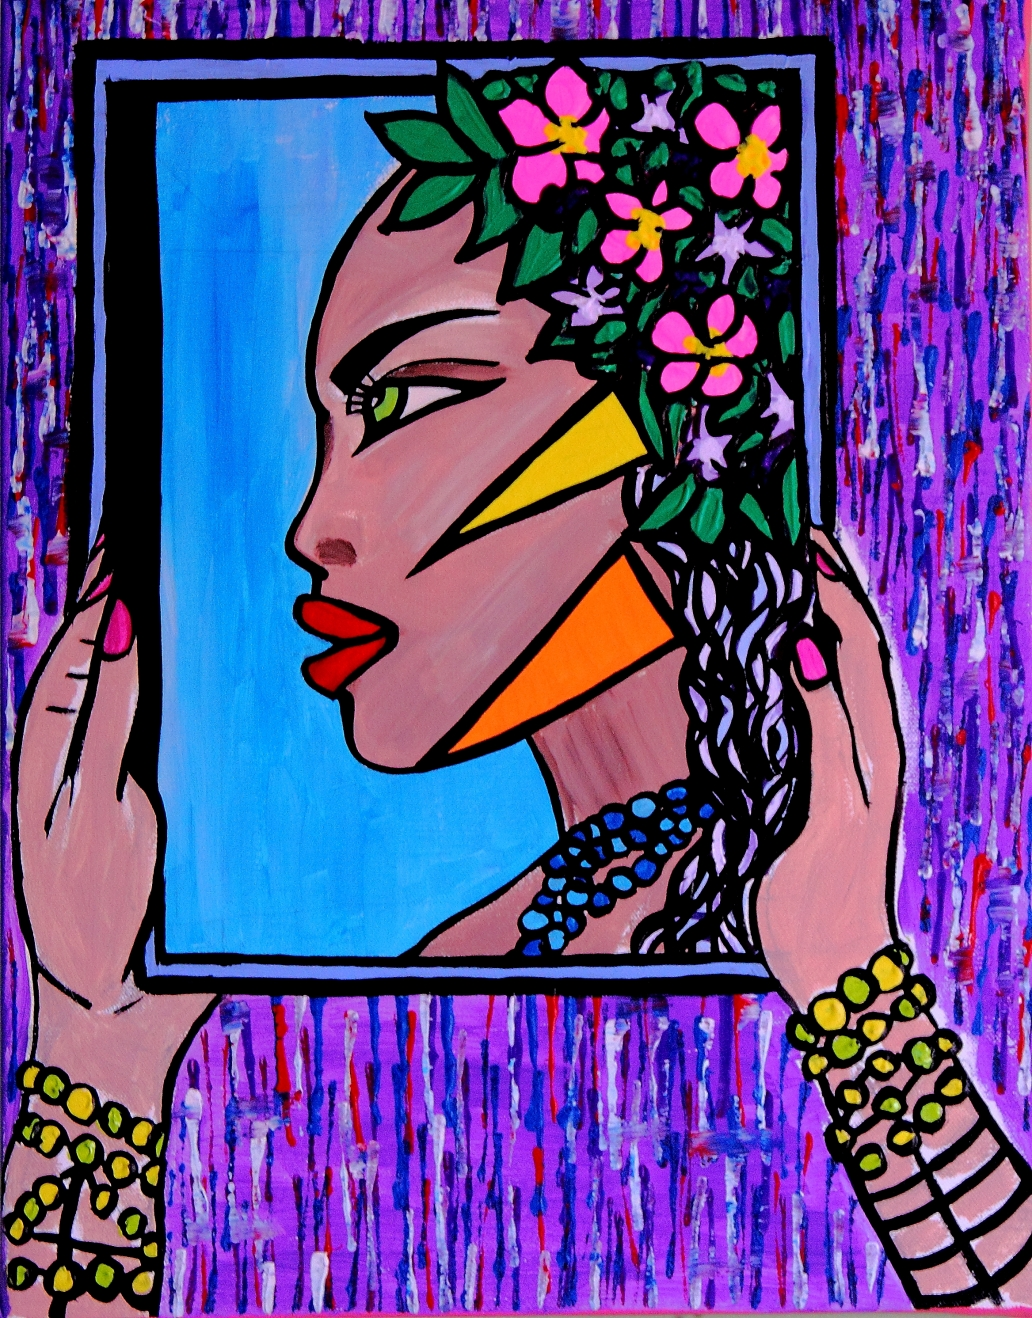 Find Your Warrioress - By Charlotte Farhan